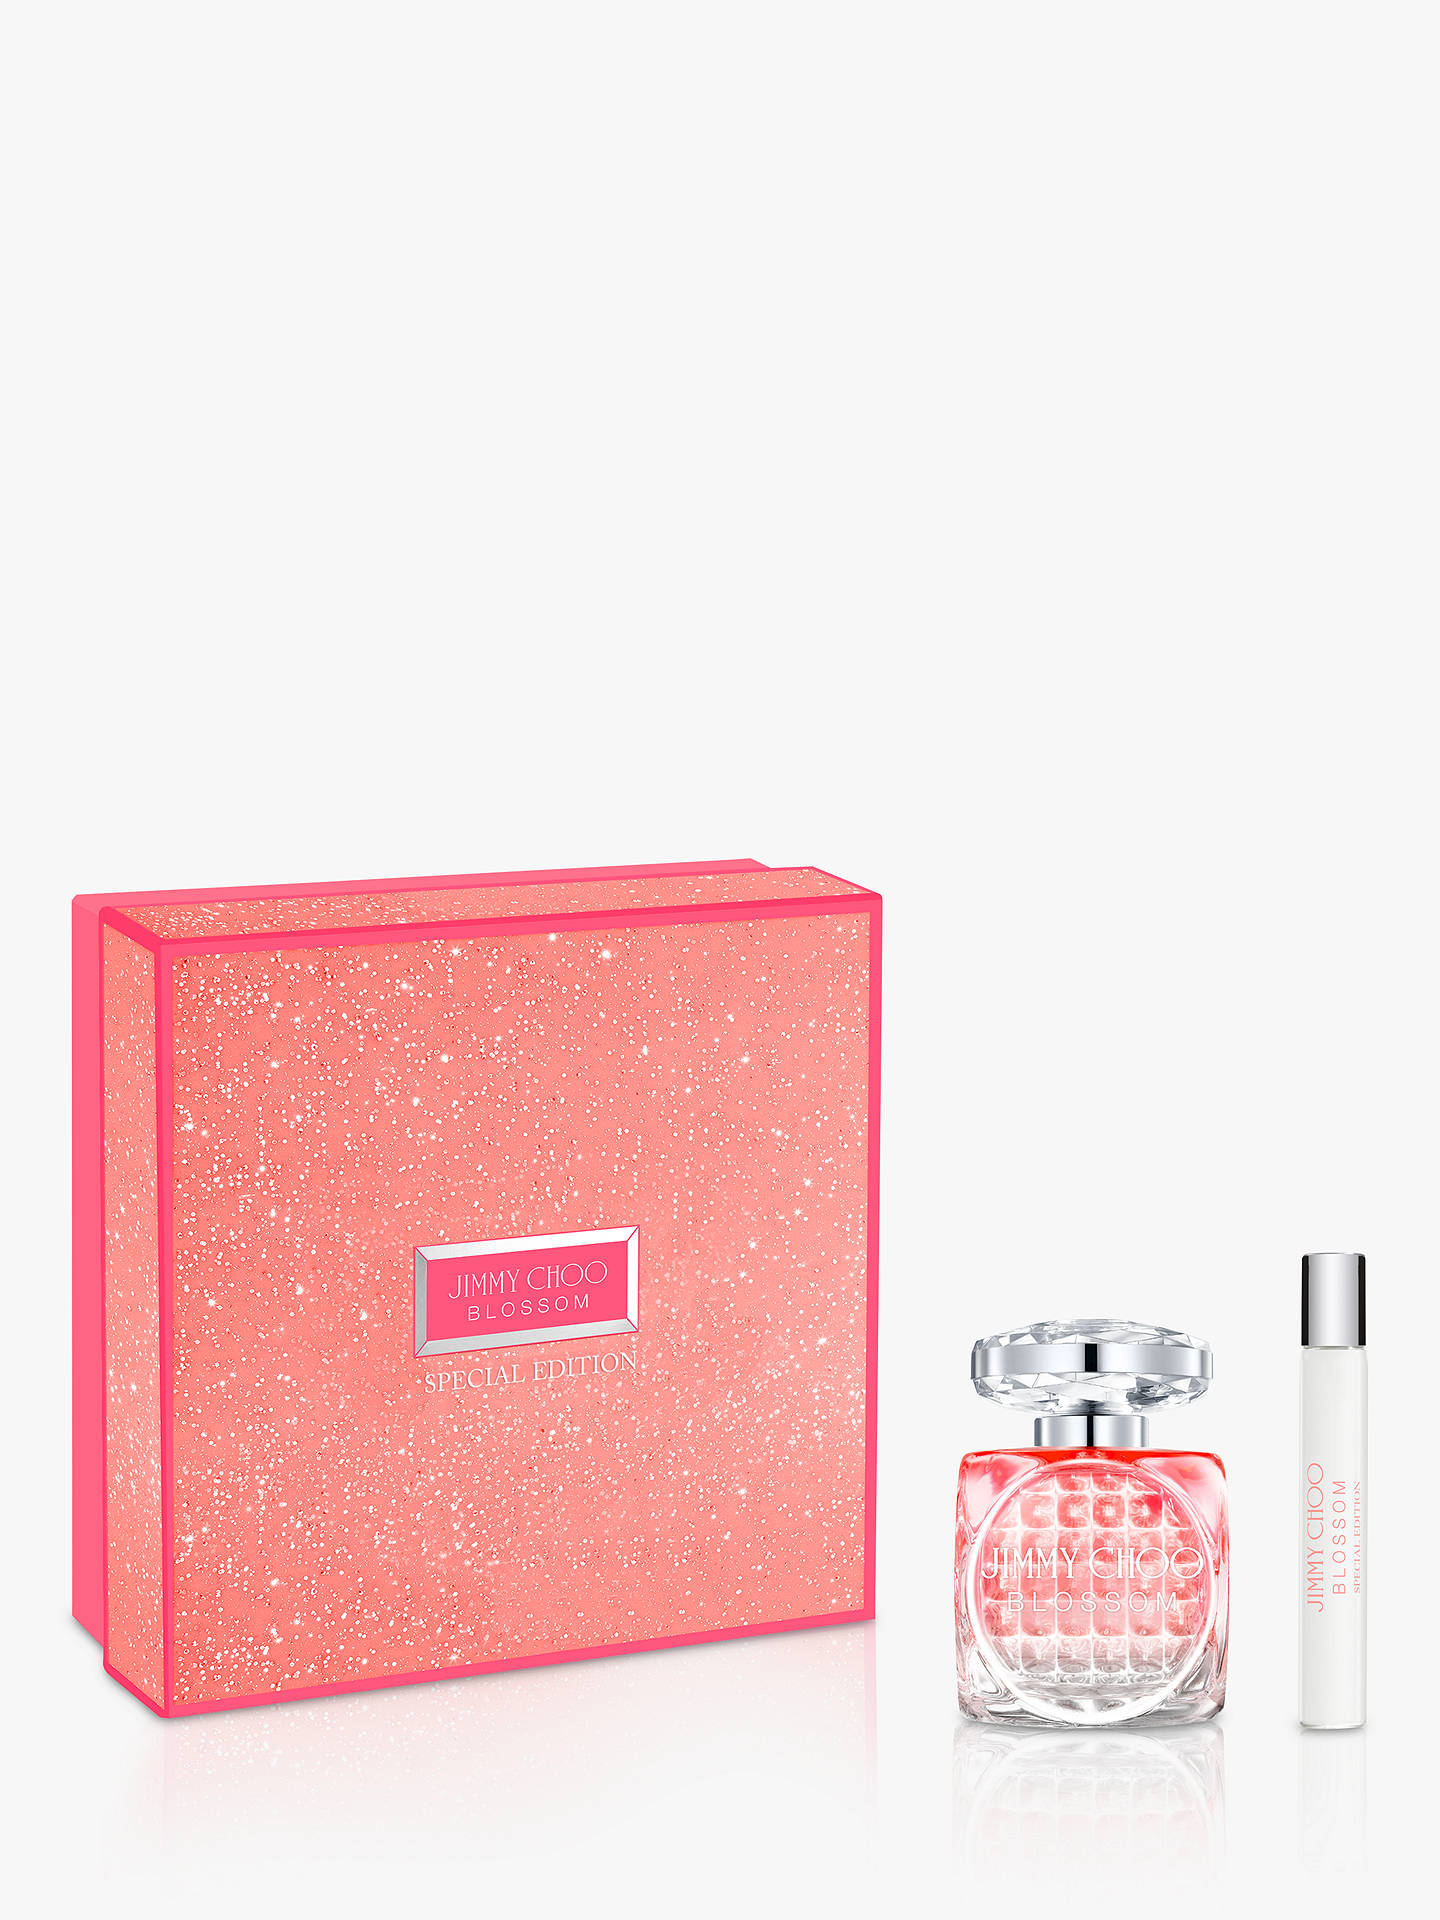 7112841b47c4 Buy Jimmy Choo Blossom Special Edition Eau de Parfum 60ml Gift Set Online  at johnlewis.